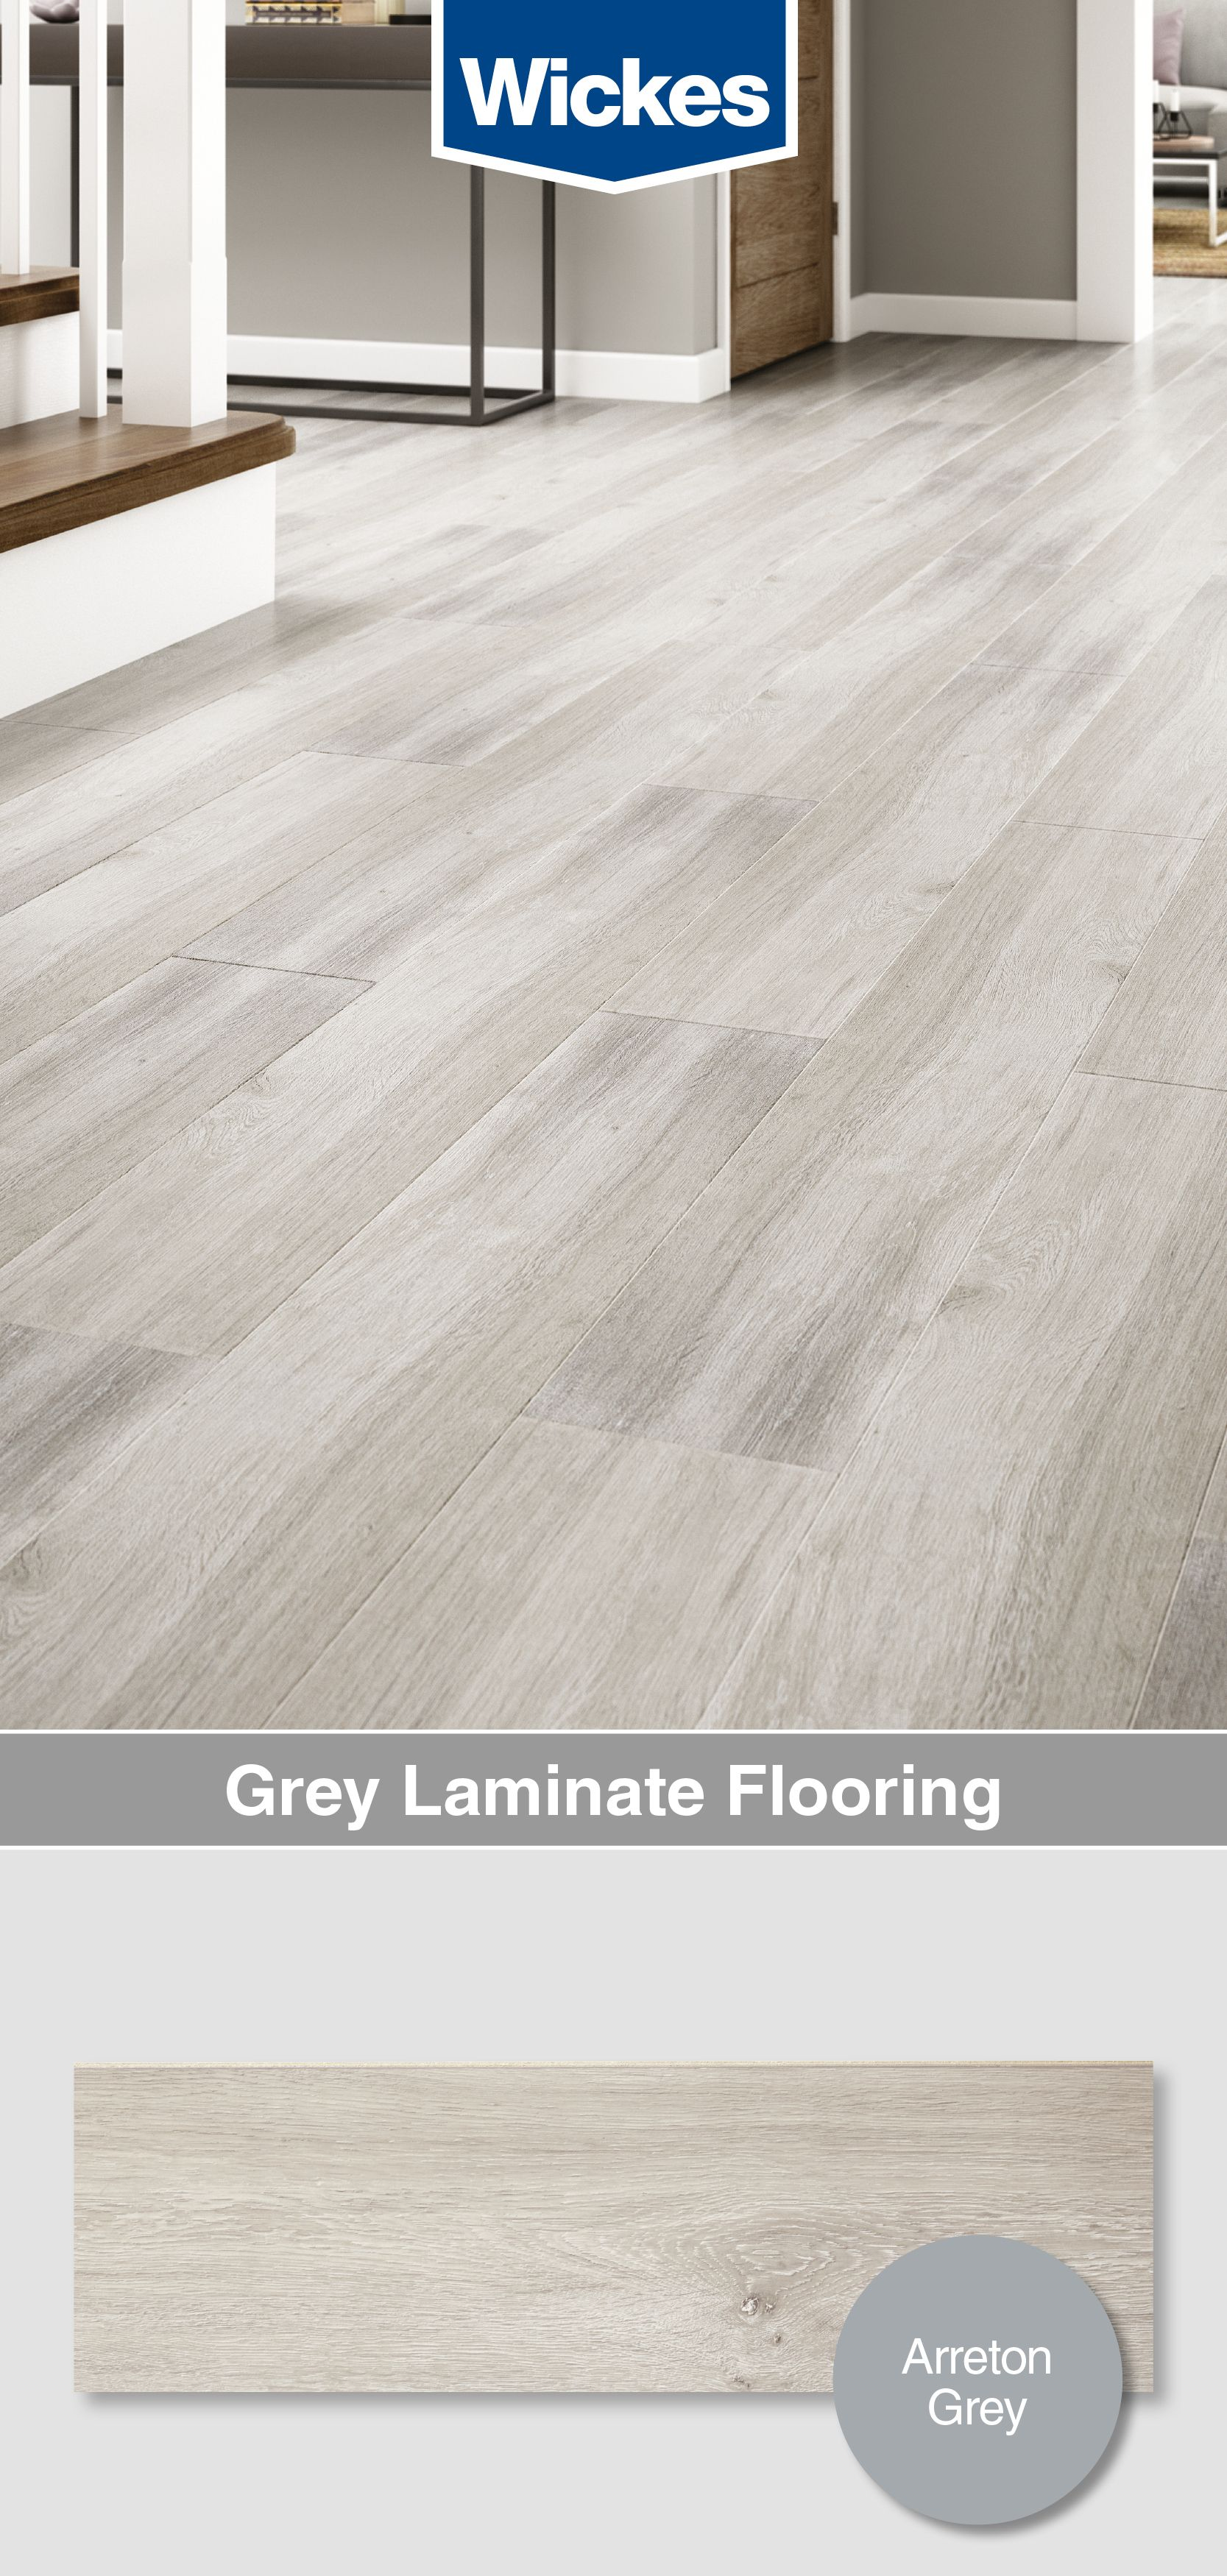 Arreton Grey Grey Laminate Flooring Laminate Flooring Grey Laminate